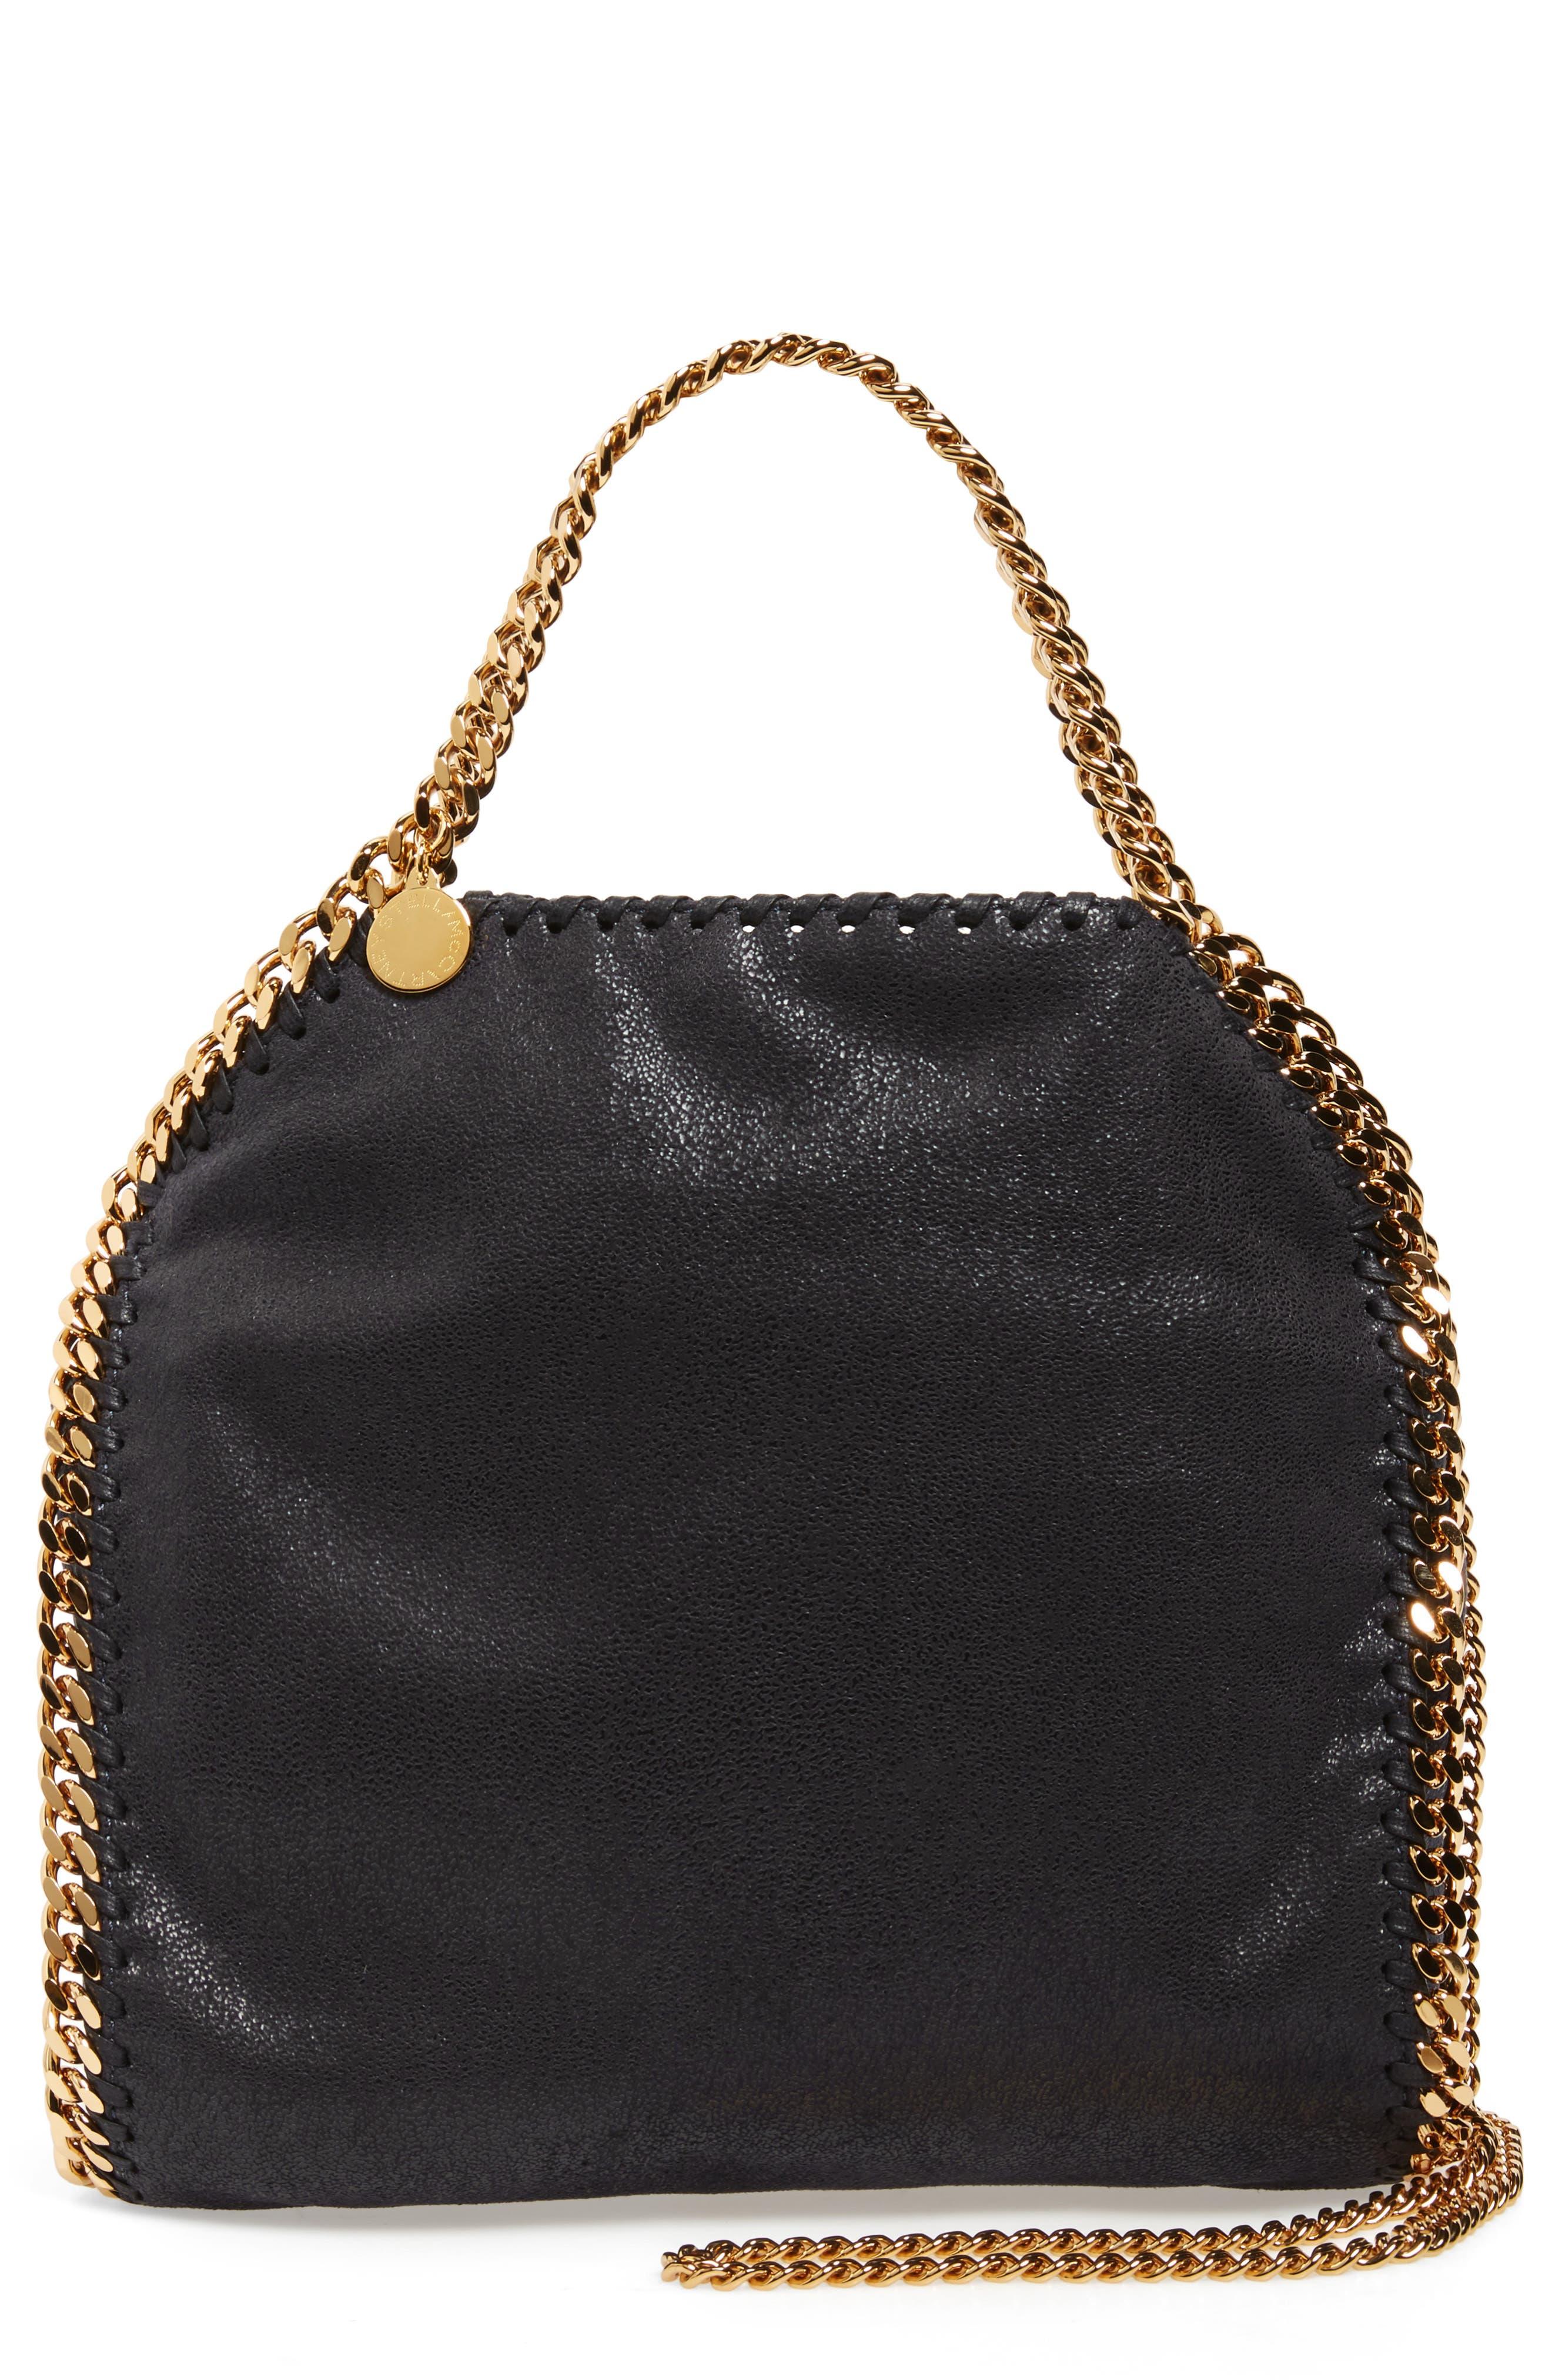 'Mini Falabella - Shaggy Deer' Faux Leather Tote, Main, color, BLACK W/ GOLD